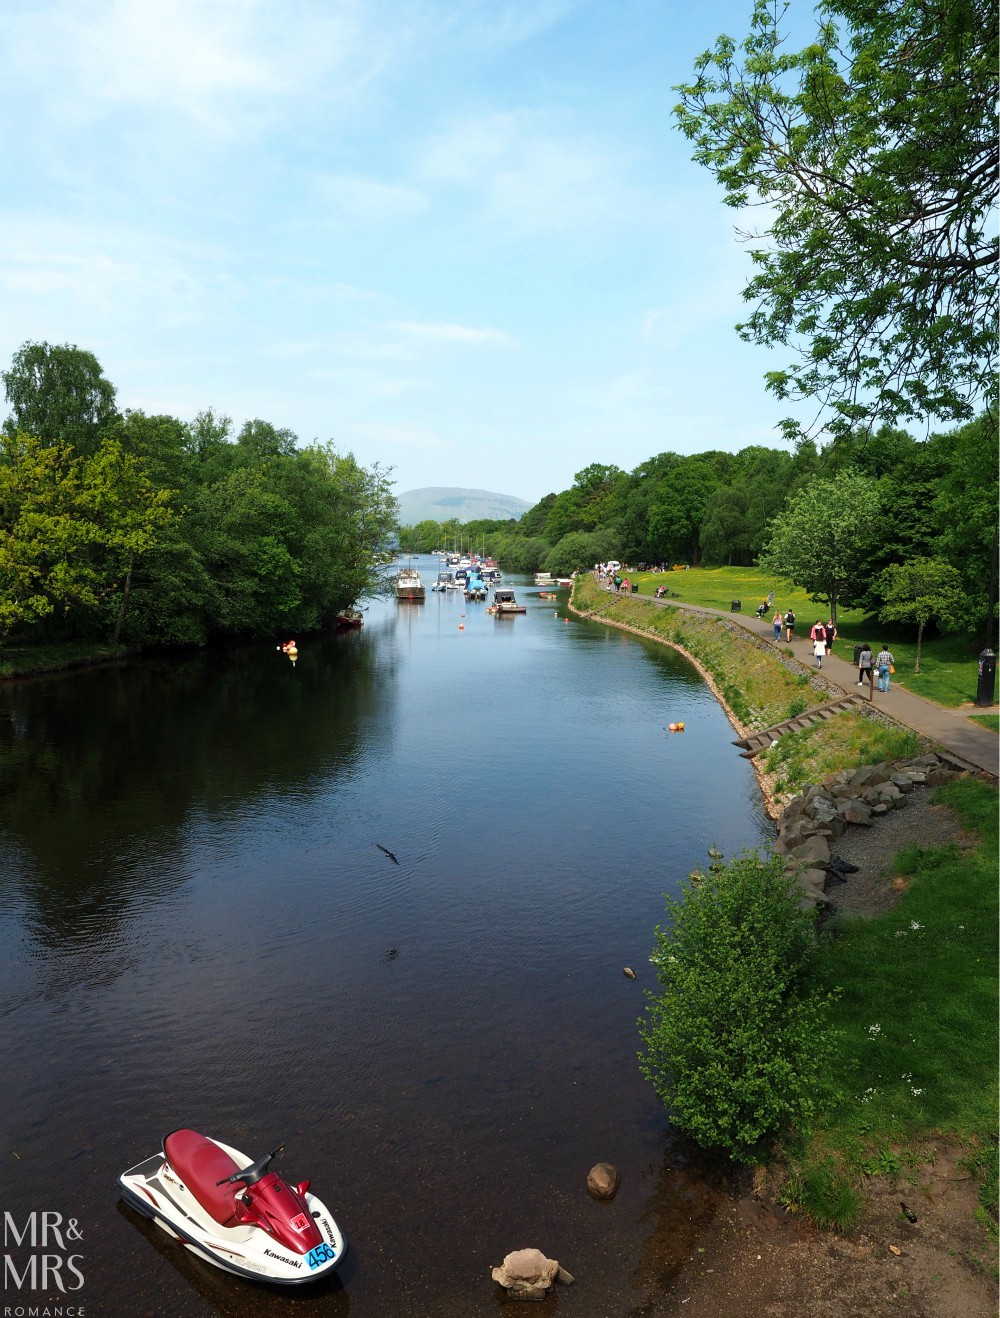 Loch Lomond without a car - Mr & Mrs Romance - Loch Lomond